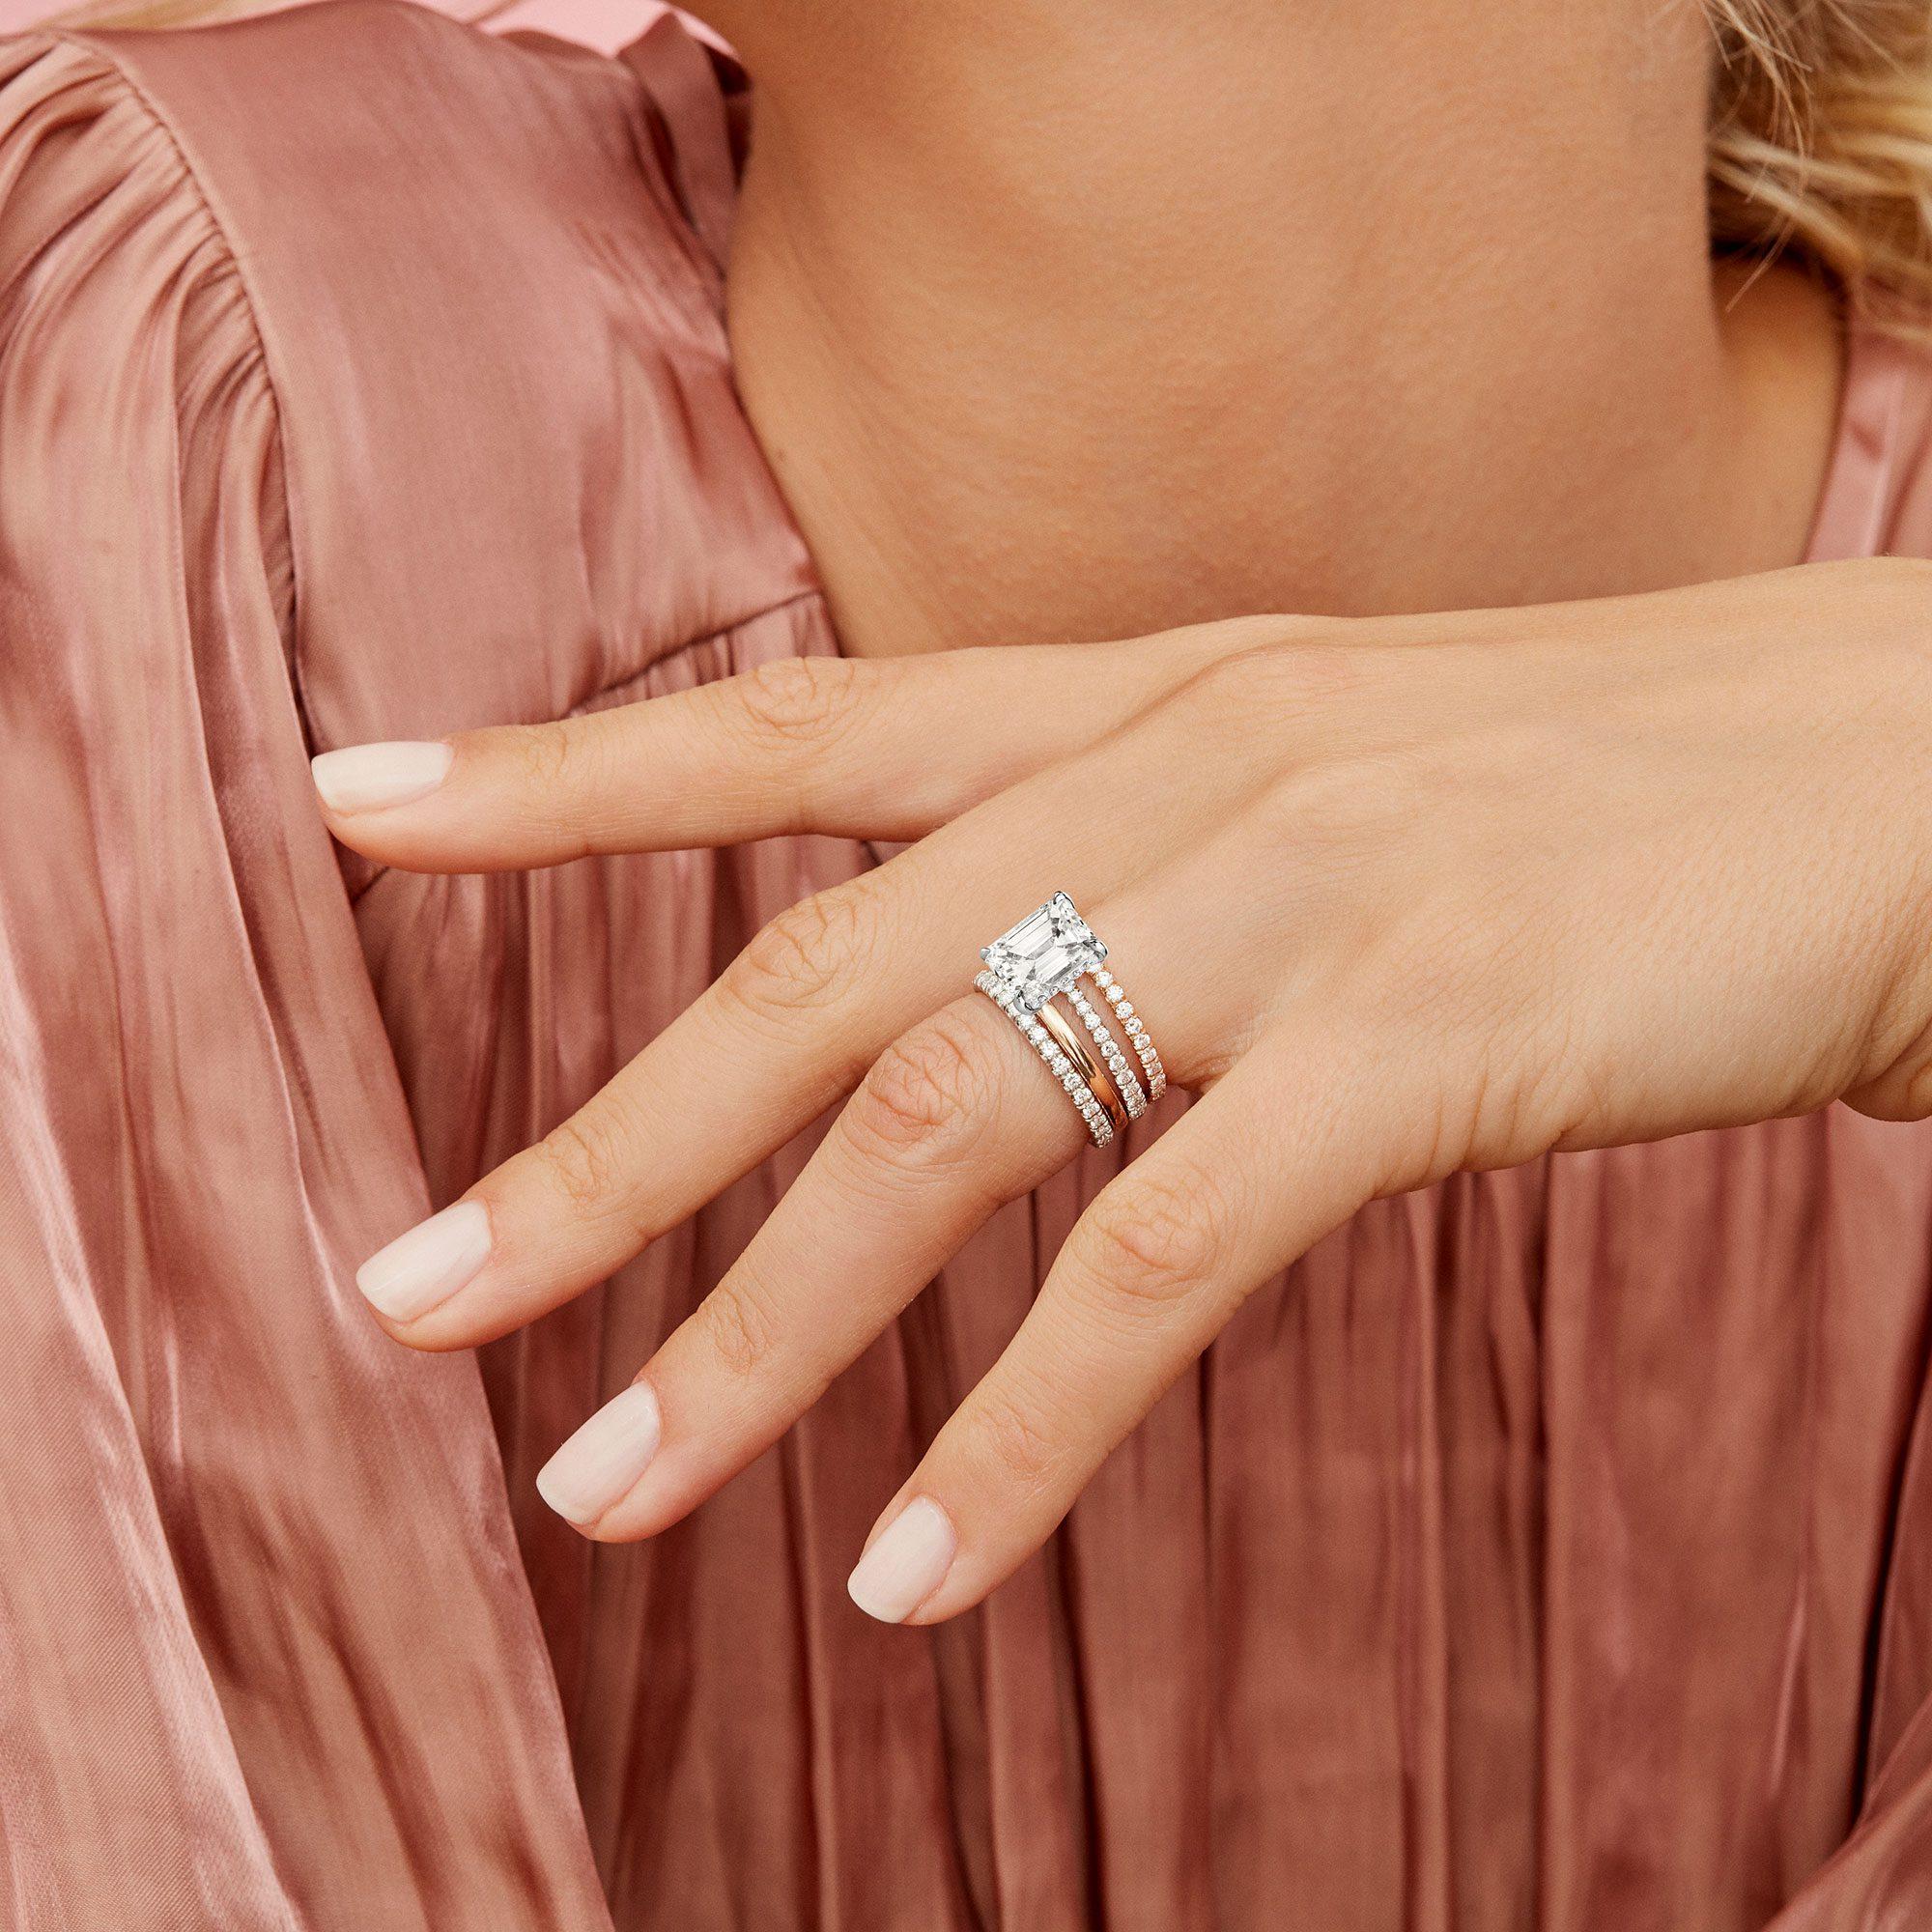 Eloise Emerald Lab Grown Diamond Ring on Hand Model